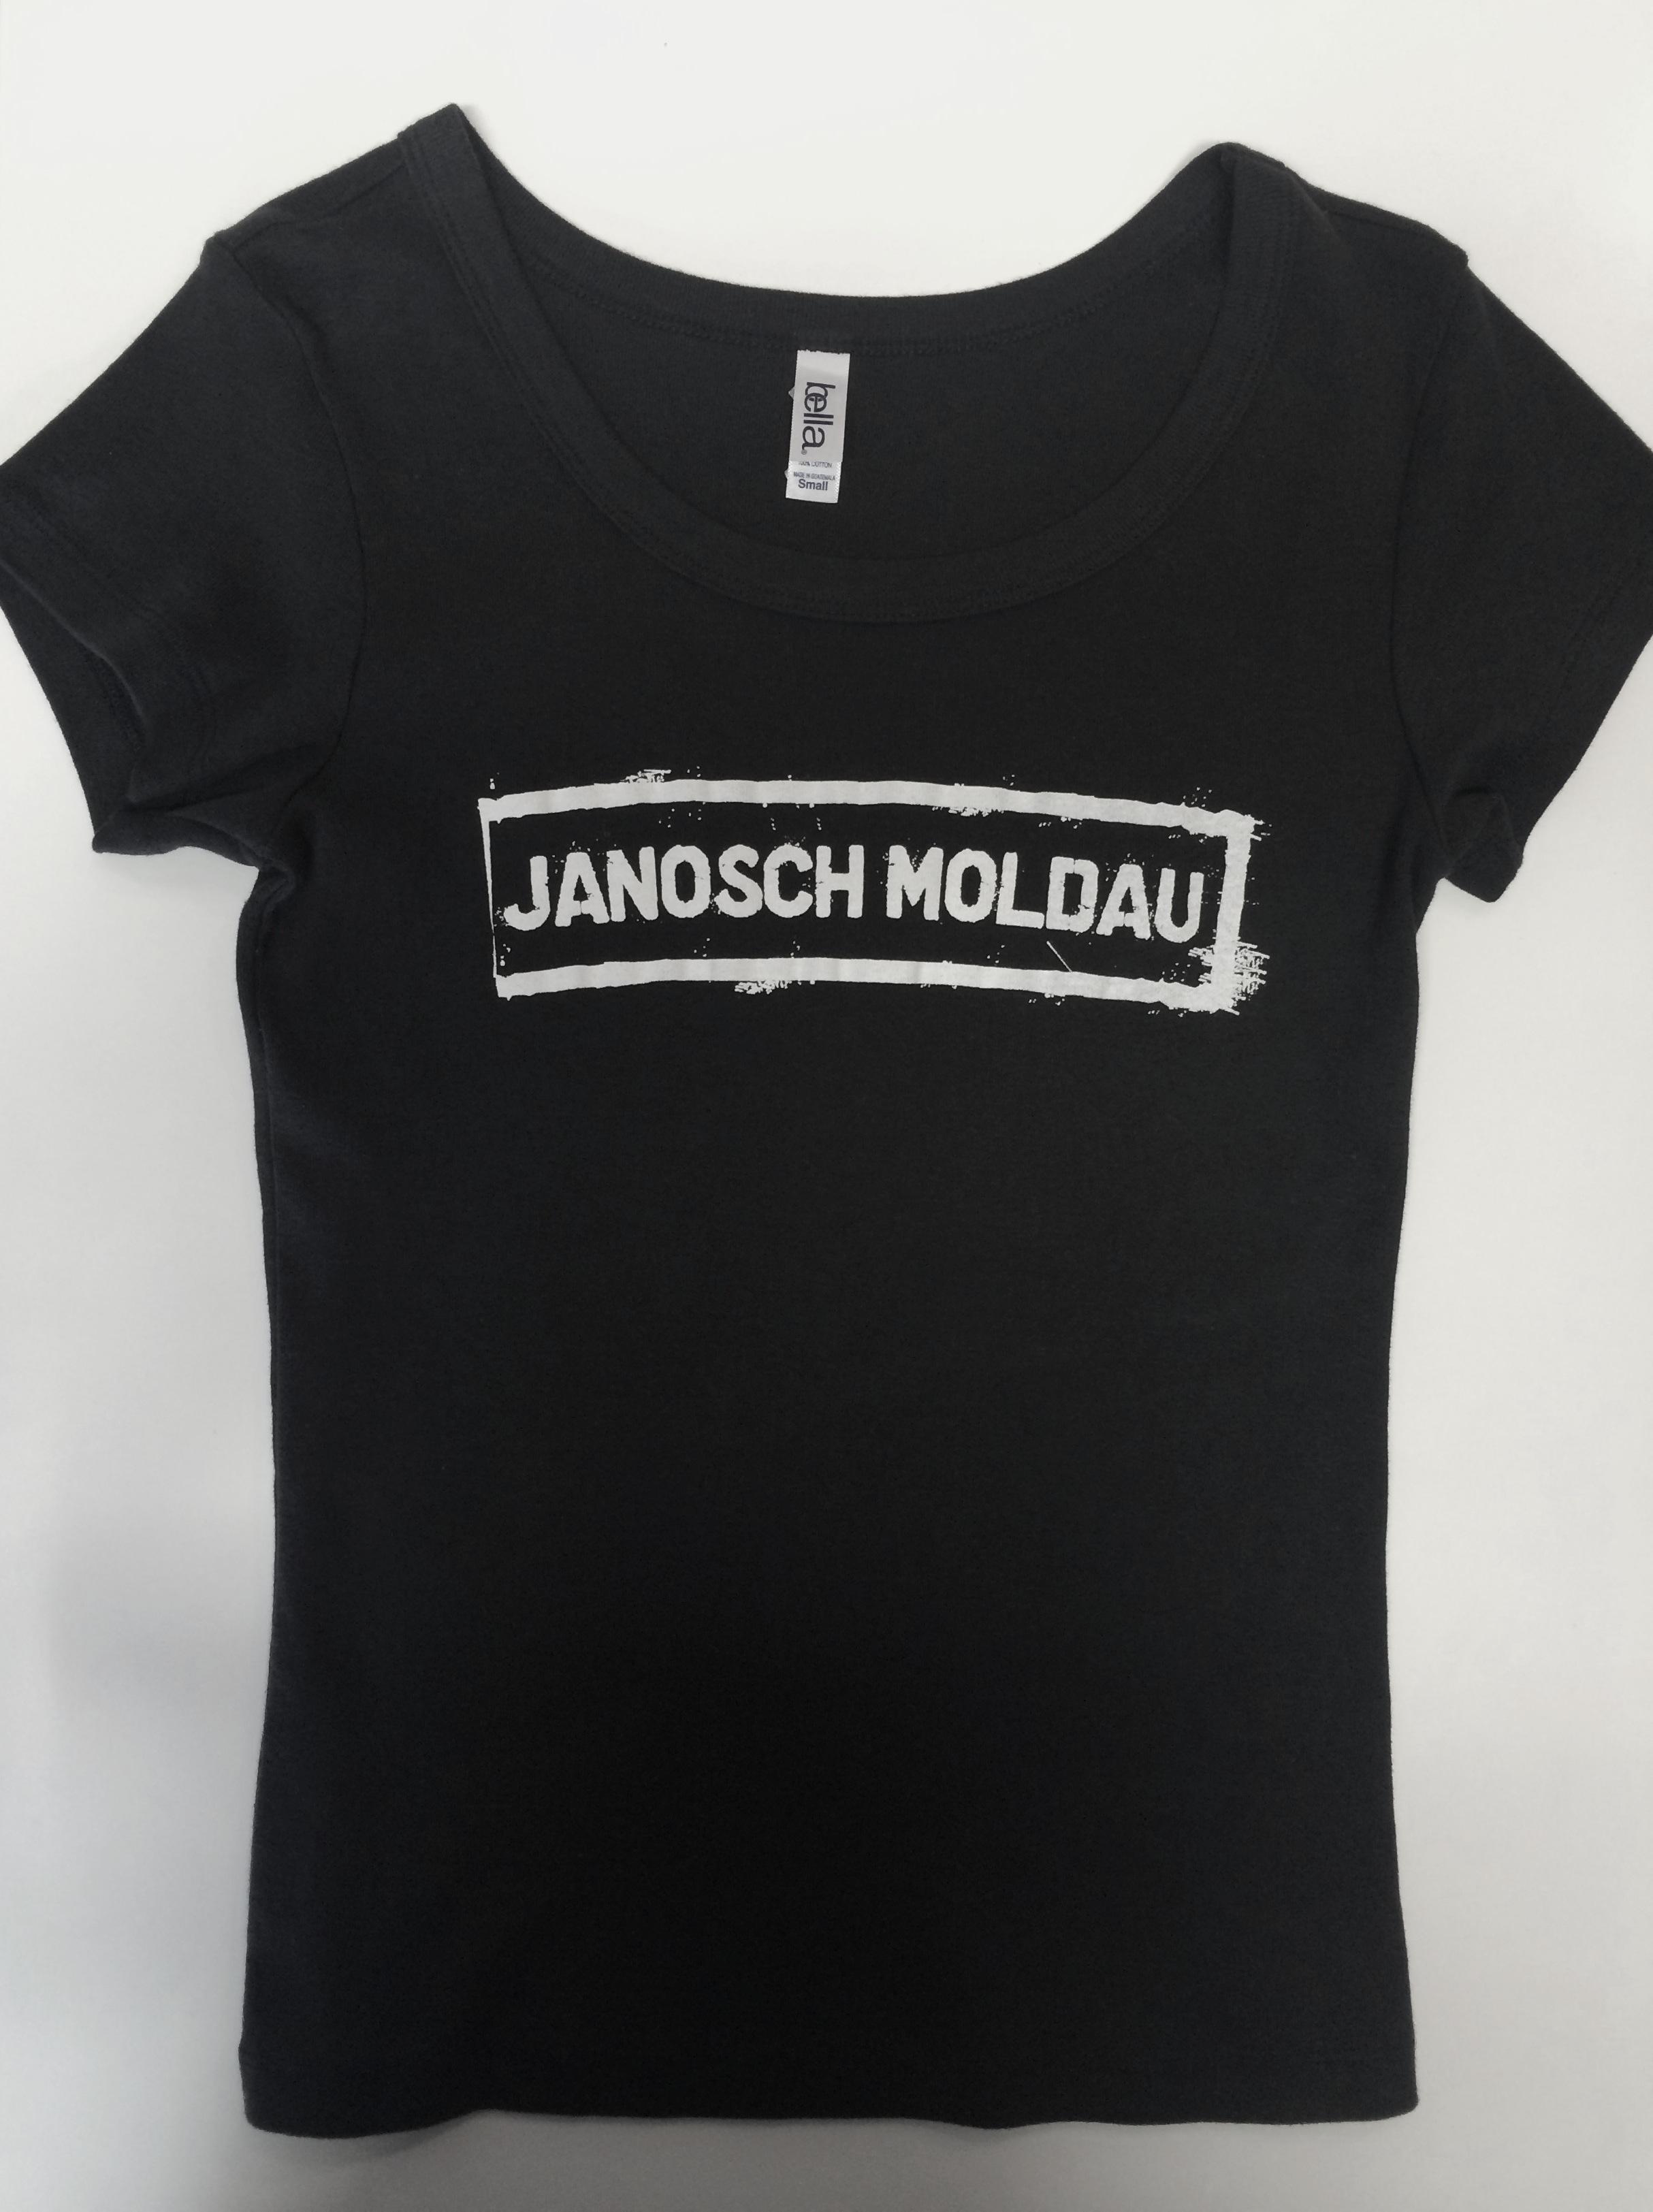 janosch moldau motel songs t-shirt